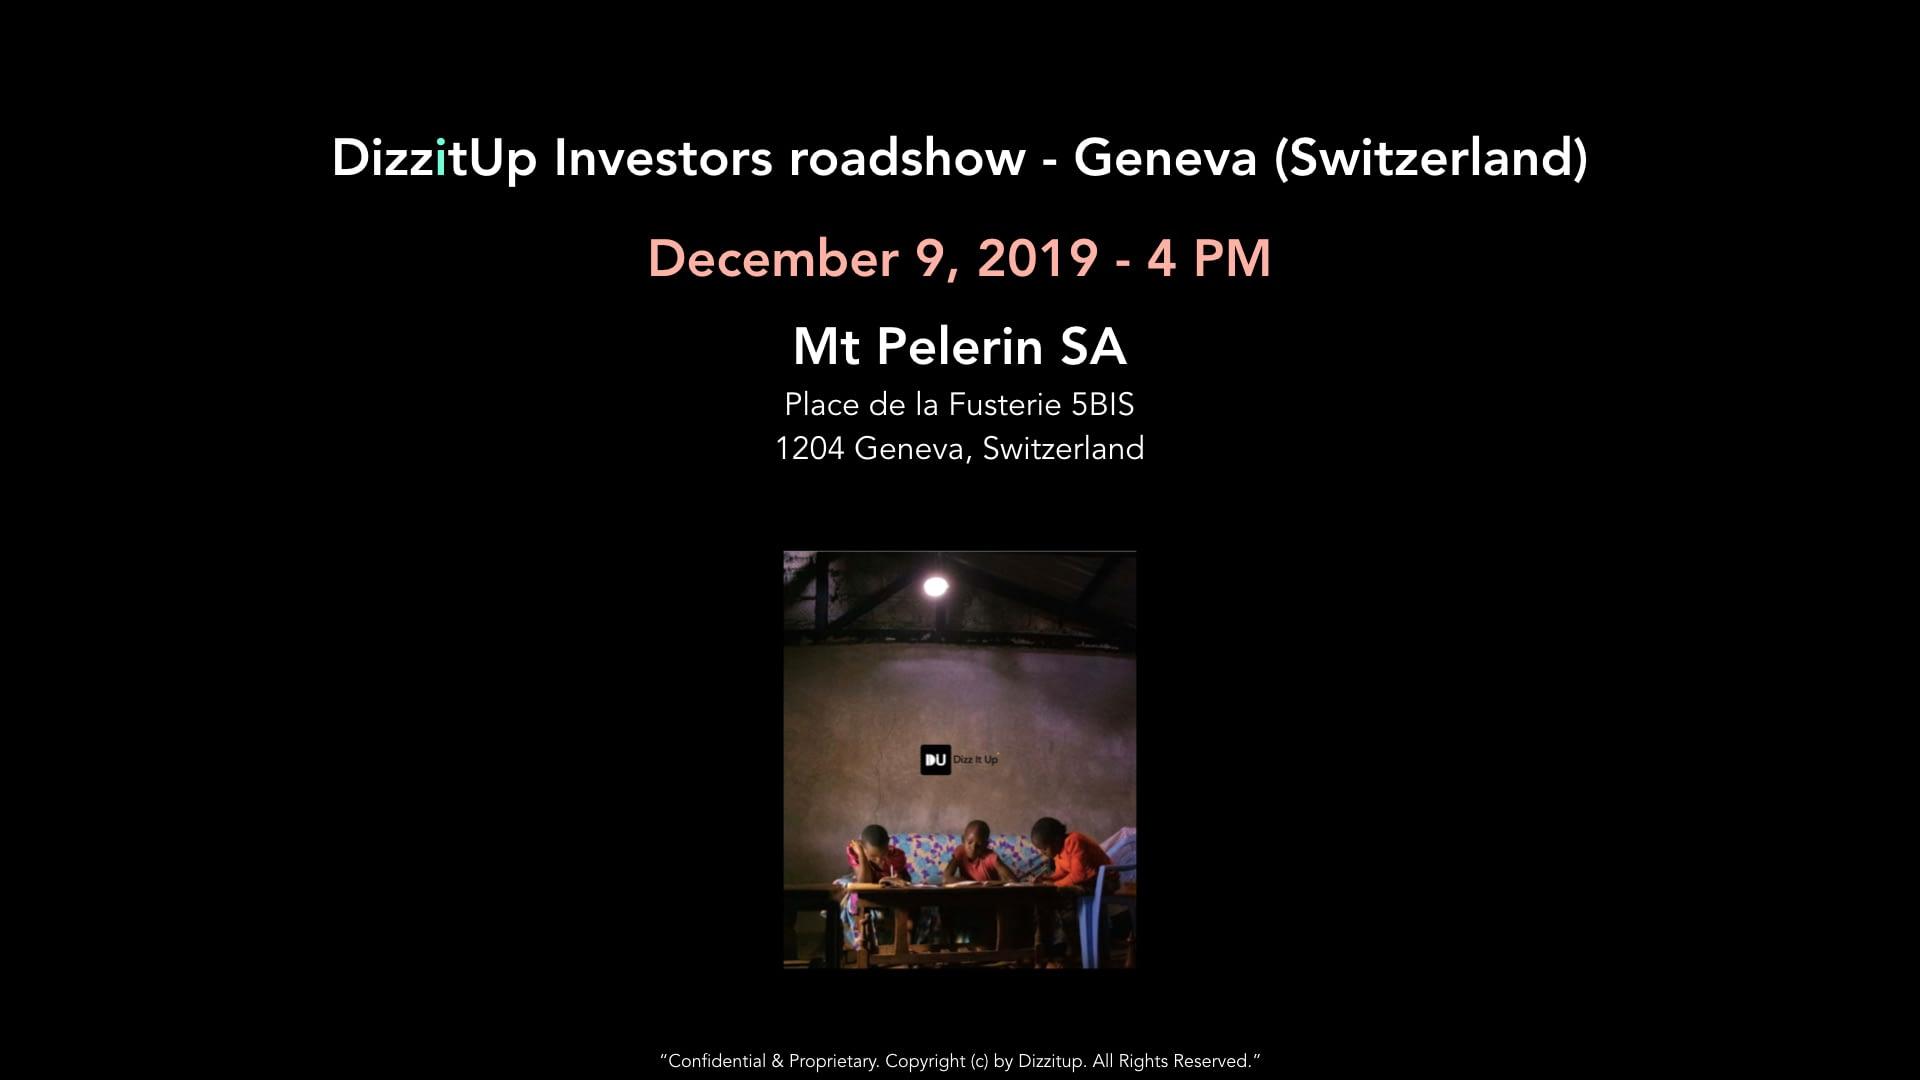 Investor roadshow - Geneva 12/09/2019